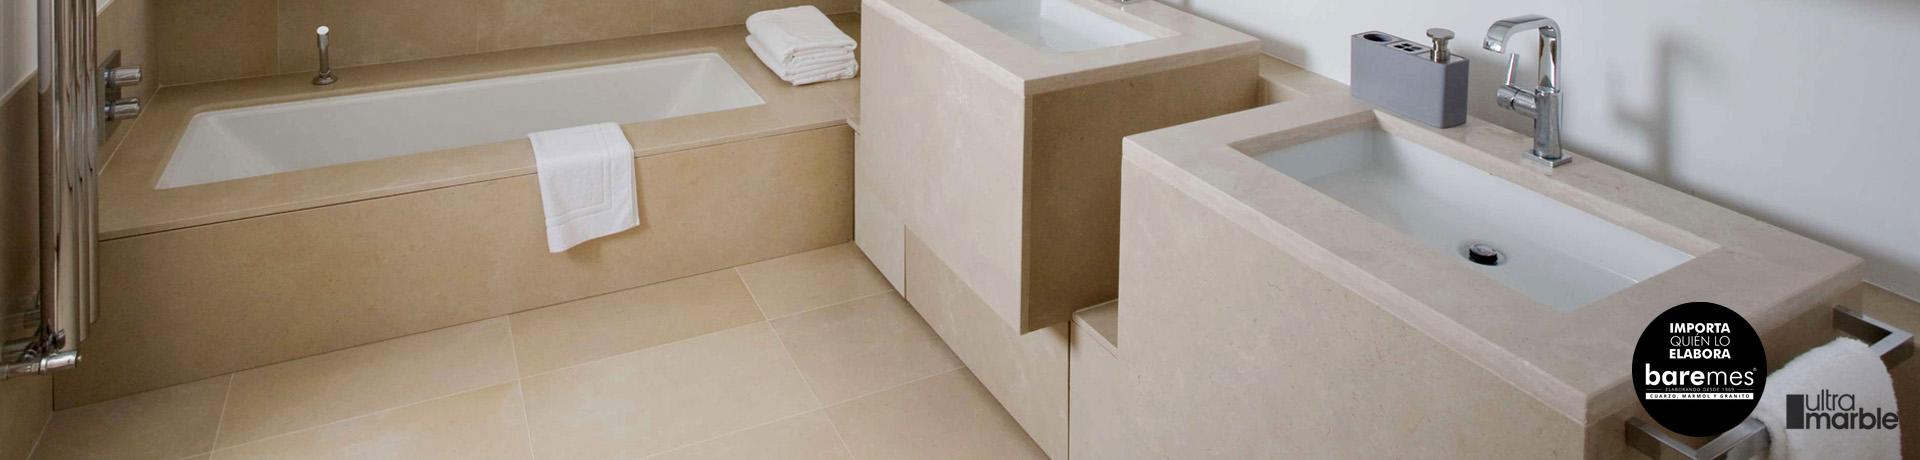 De Marmol para baños? Mejor Ultramarble|Mesadas baremes